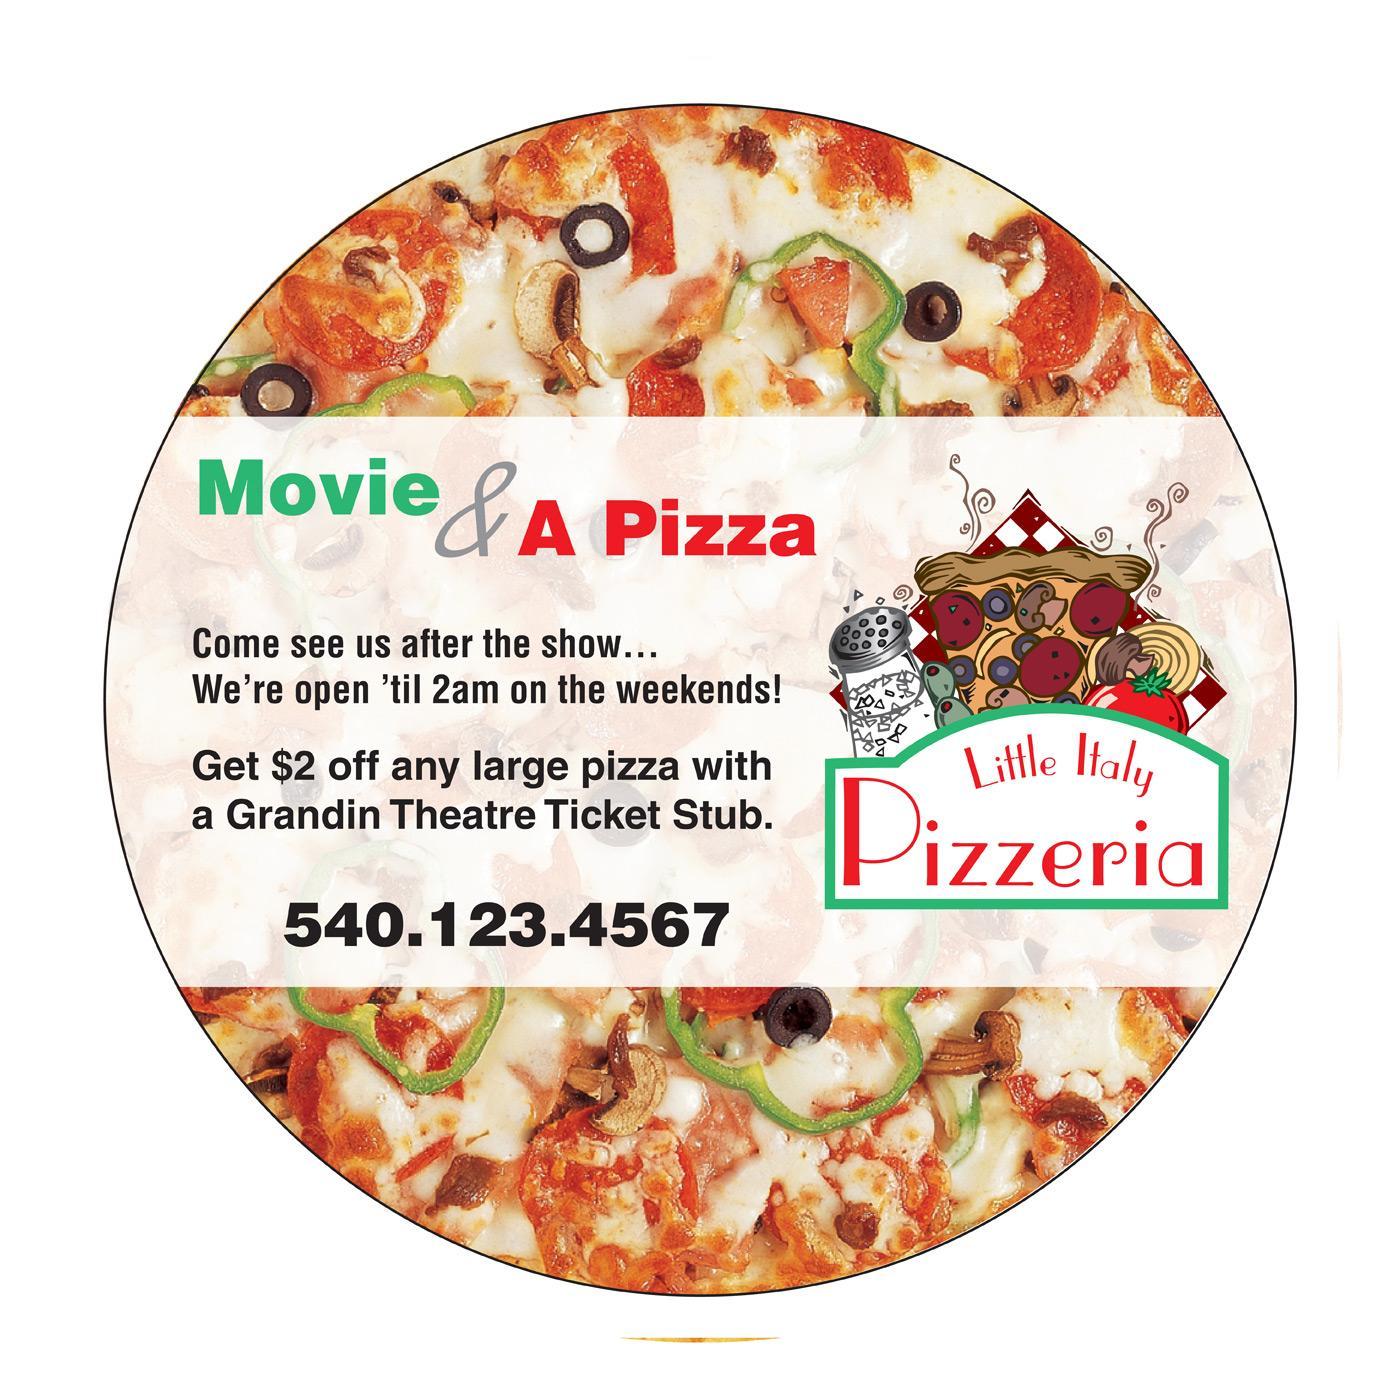 Round Pizza Refrigerator Magnet